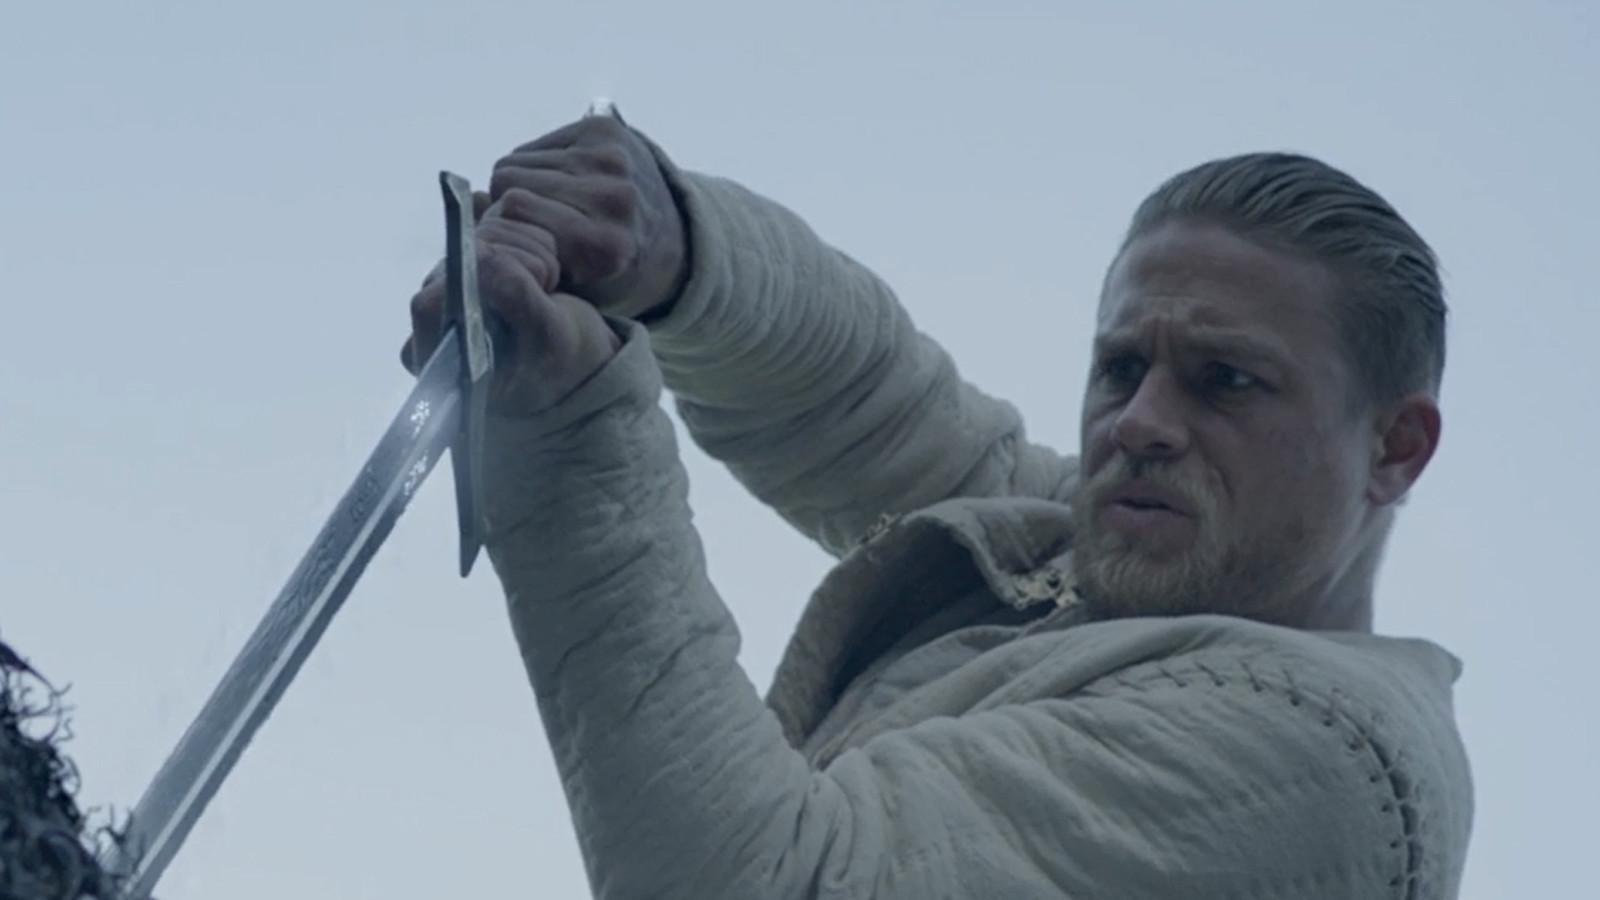 king arthur legend of the sword u0027 poised for soft box office